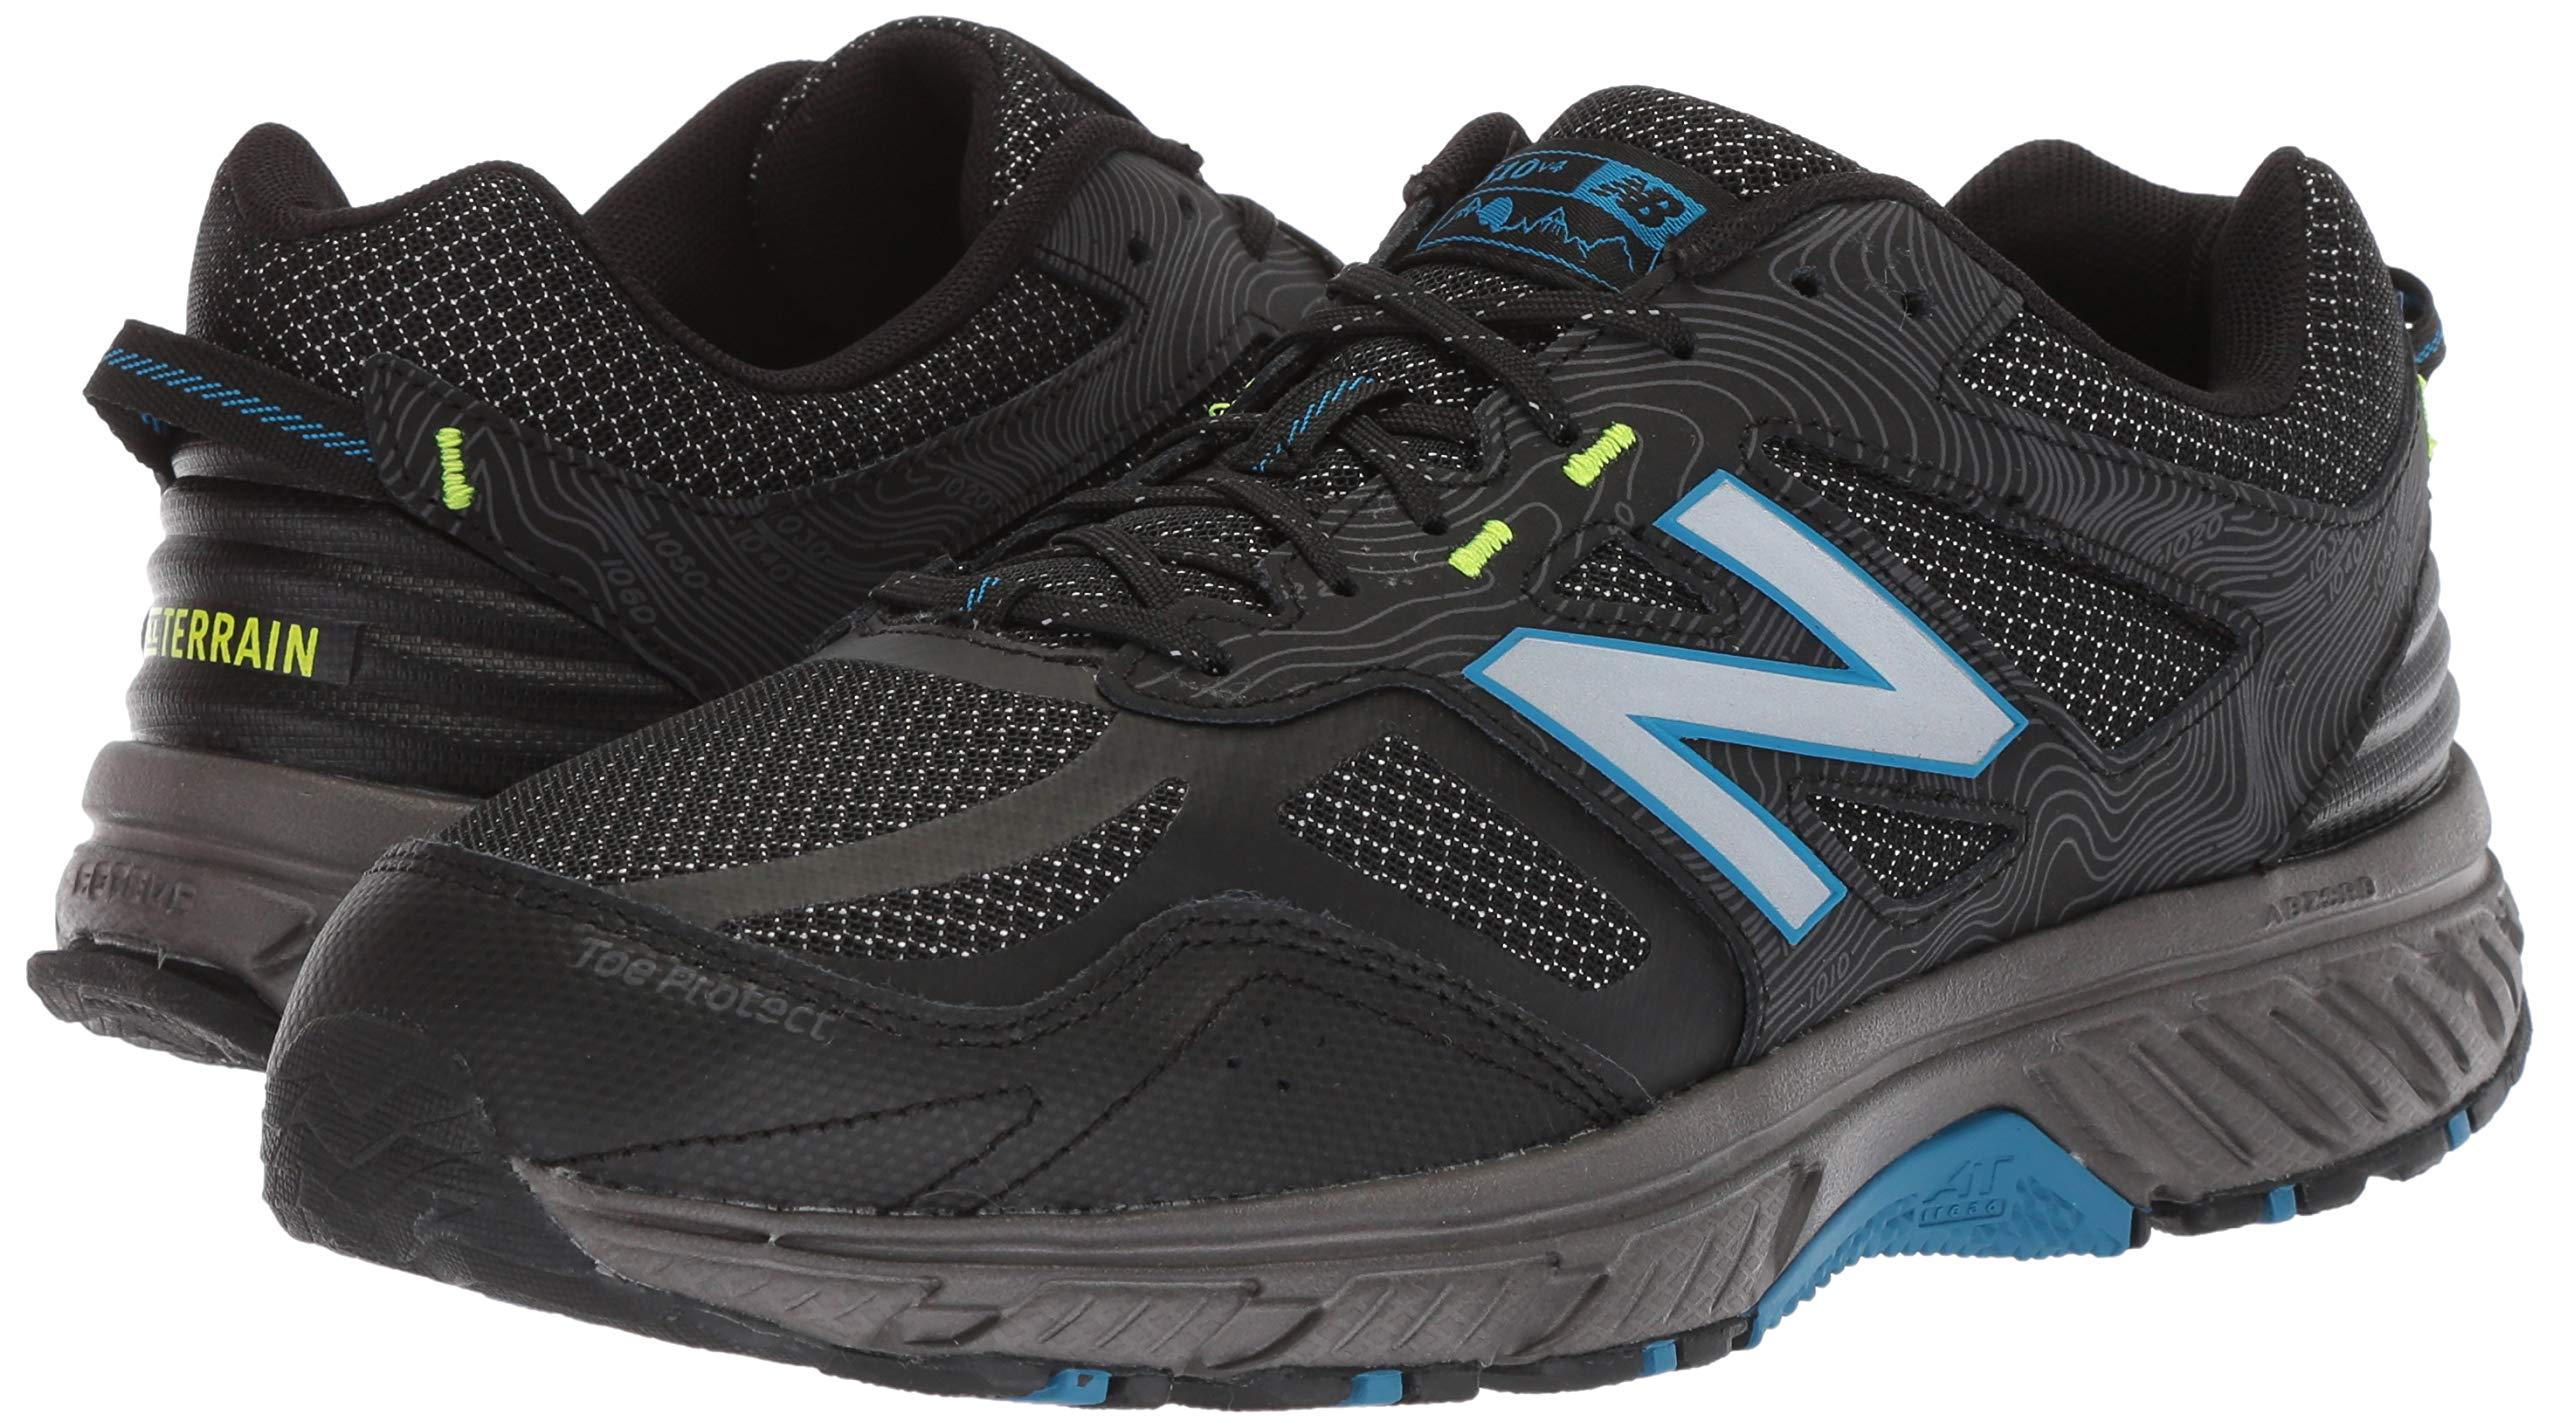 New Balance Men's 510v4 Cushioning Trail Running Shoe, Magnet/Black/Reflective, 7.5 D US by New Balance (Image #6)